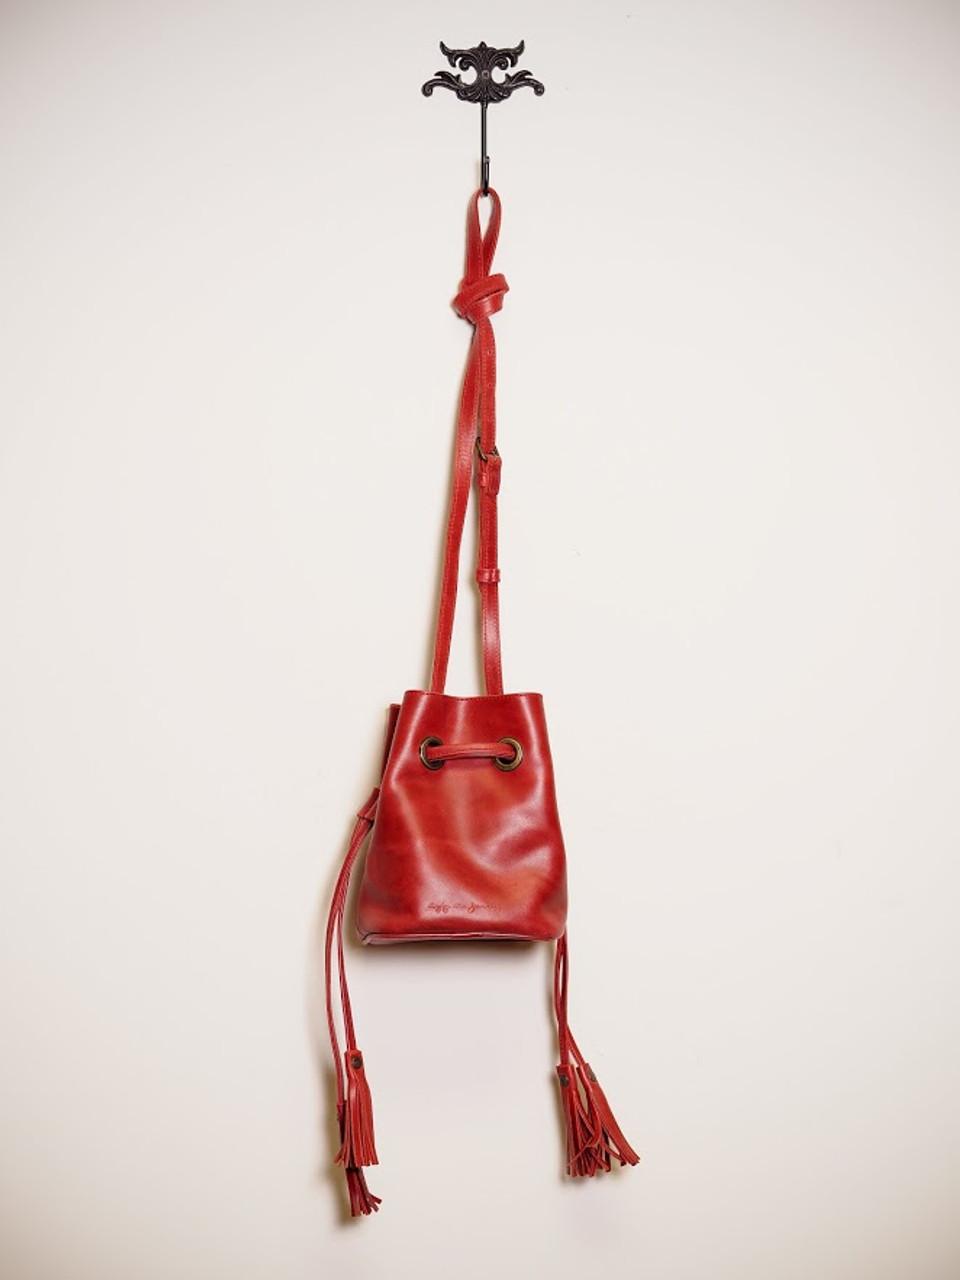 Mini Correa Bucket Bag in Red